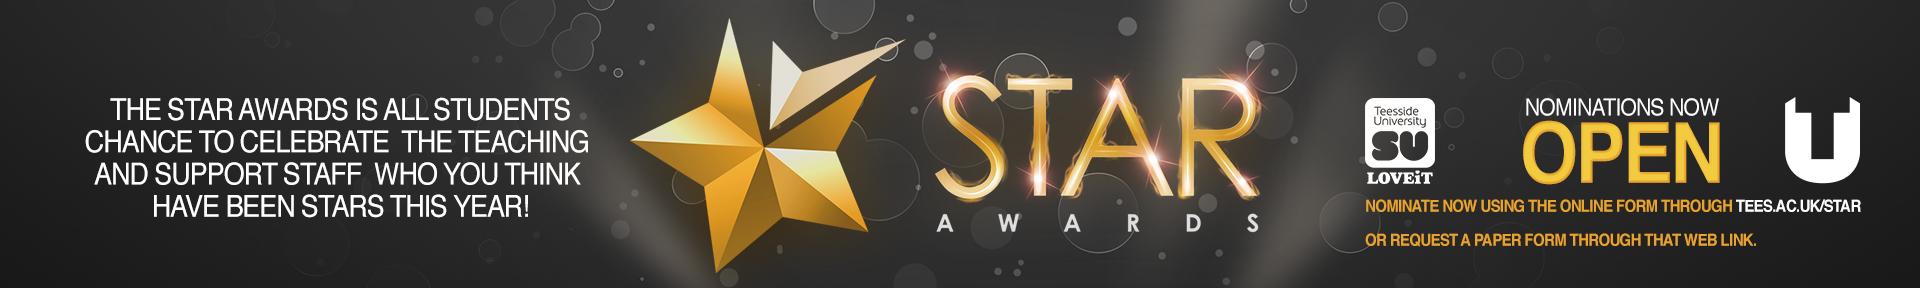 Star awards 2020 small web